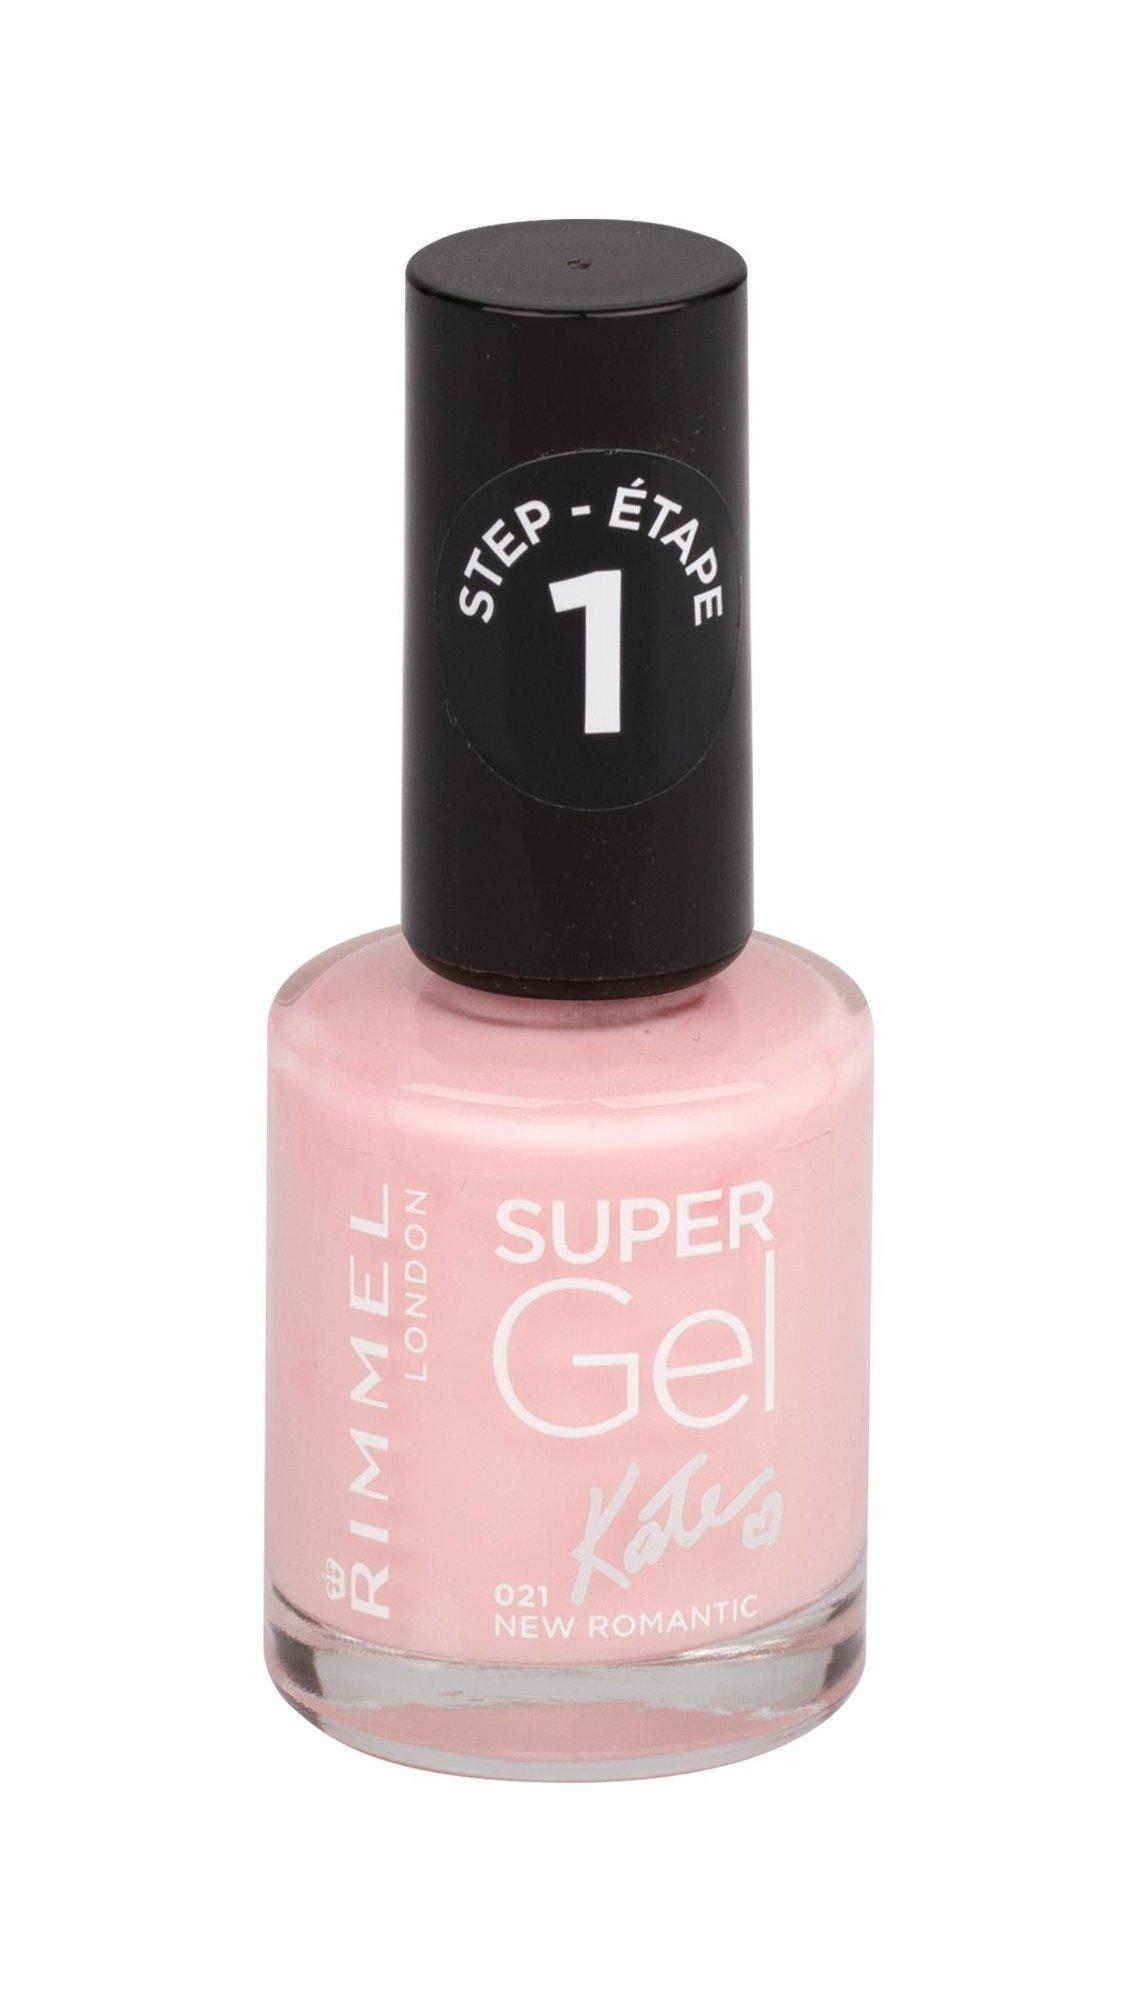 Rimmel London Super Gel By Kate STEP1 - (021 New Romantic) lak na nehty W Objem: 12 ml